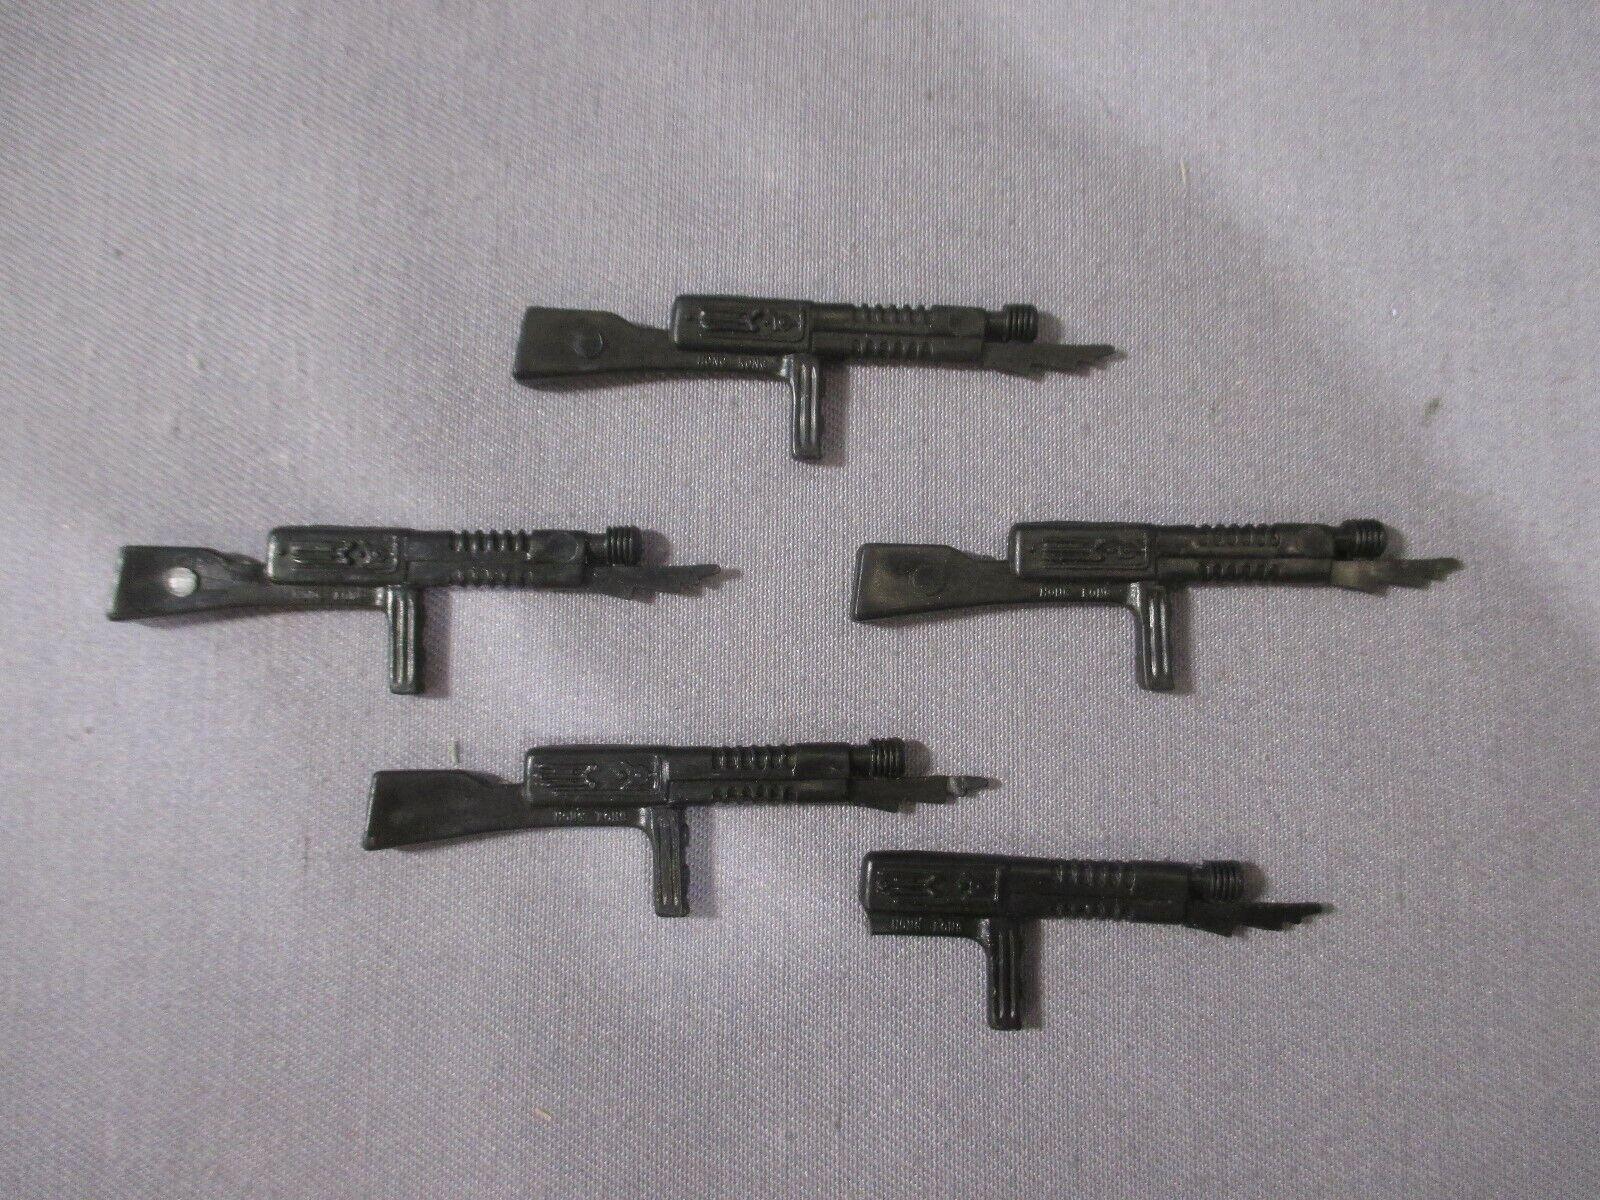 battlestar Galactica CYLON RAIDER GUN Acessory Lot of 4 Vintage 1978 Mattel